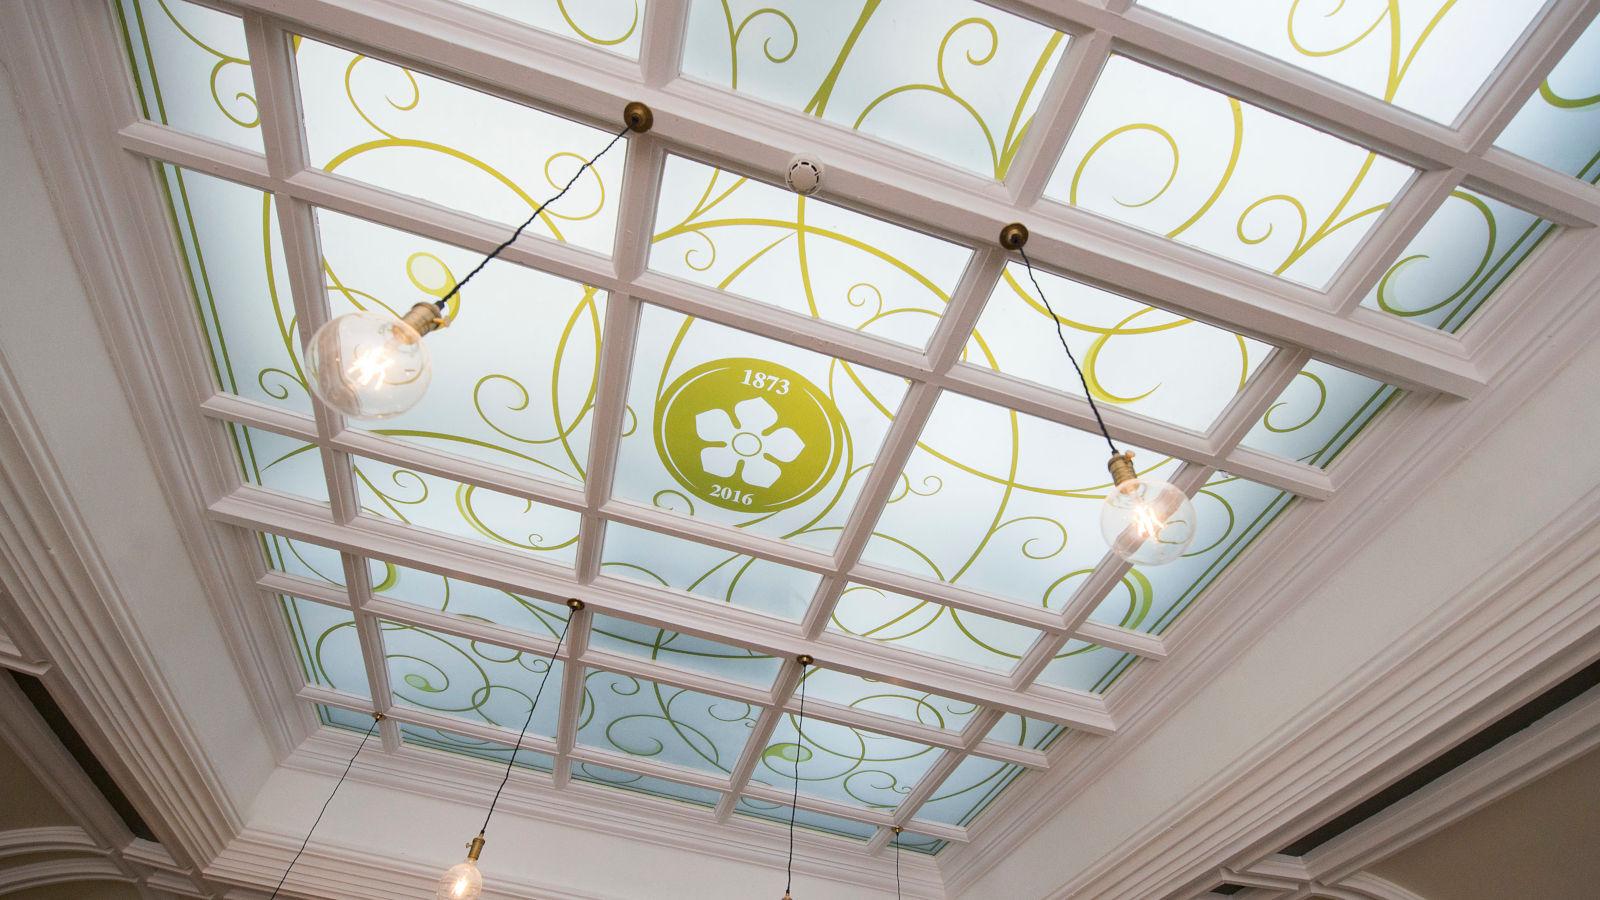 Leicester Greyfriars Heritage Initiative - Restoration - 4 St Martins